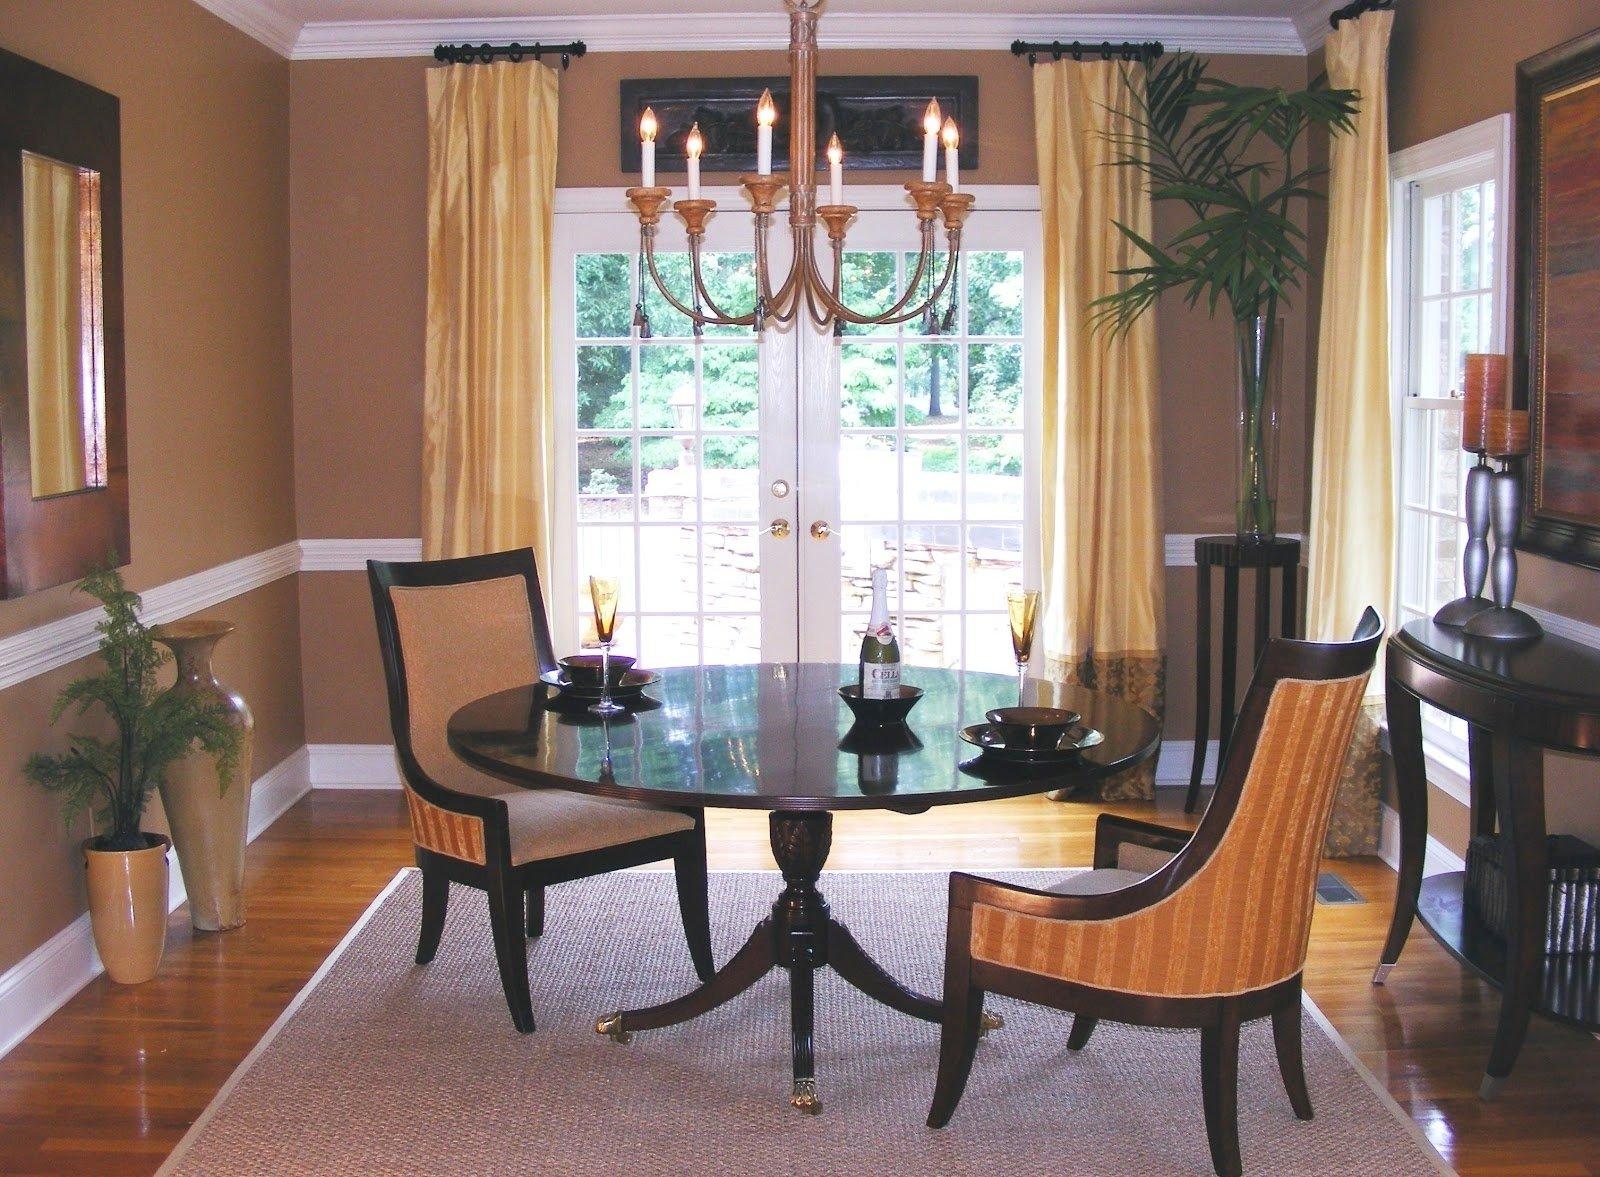 10 Unique Dining Room Window Treatment Ideas top dining room window treatment ideas image andrea outloud 2021